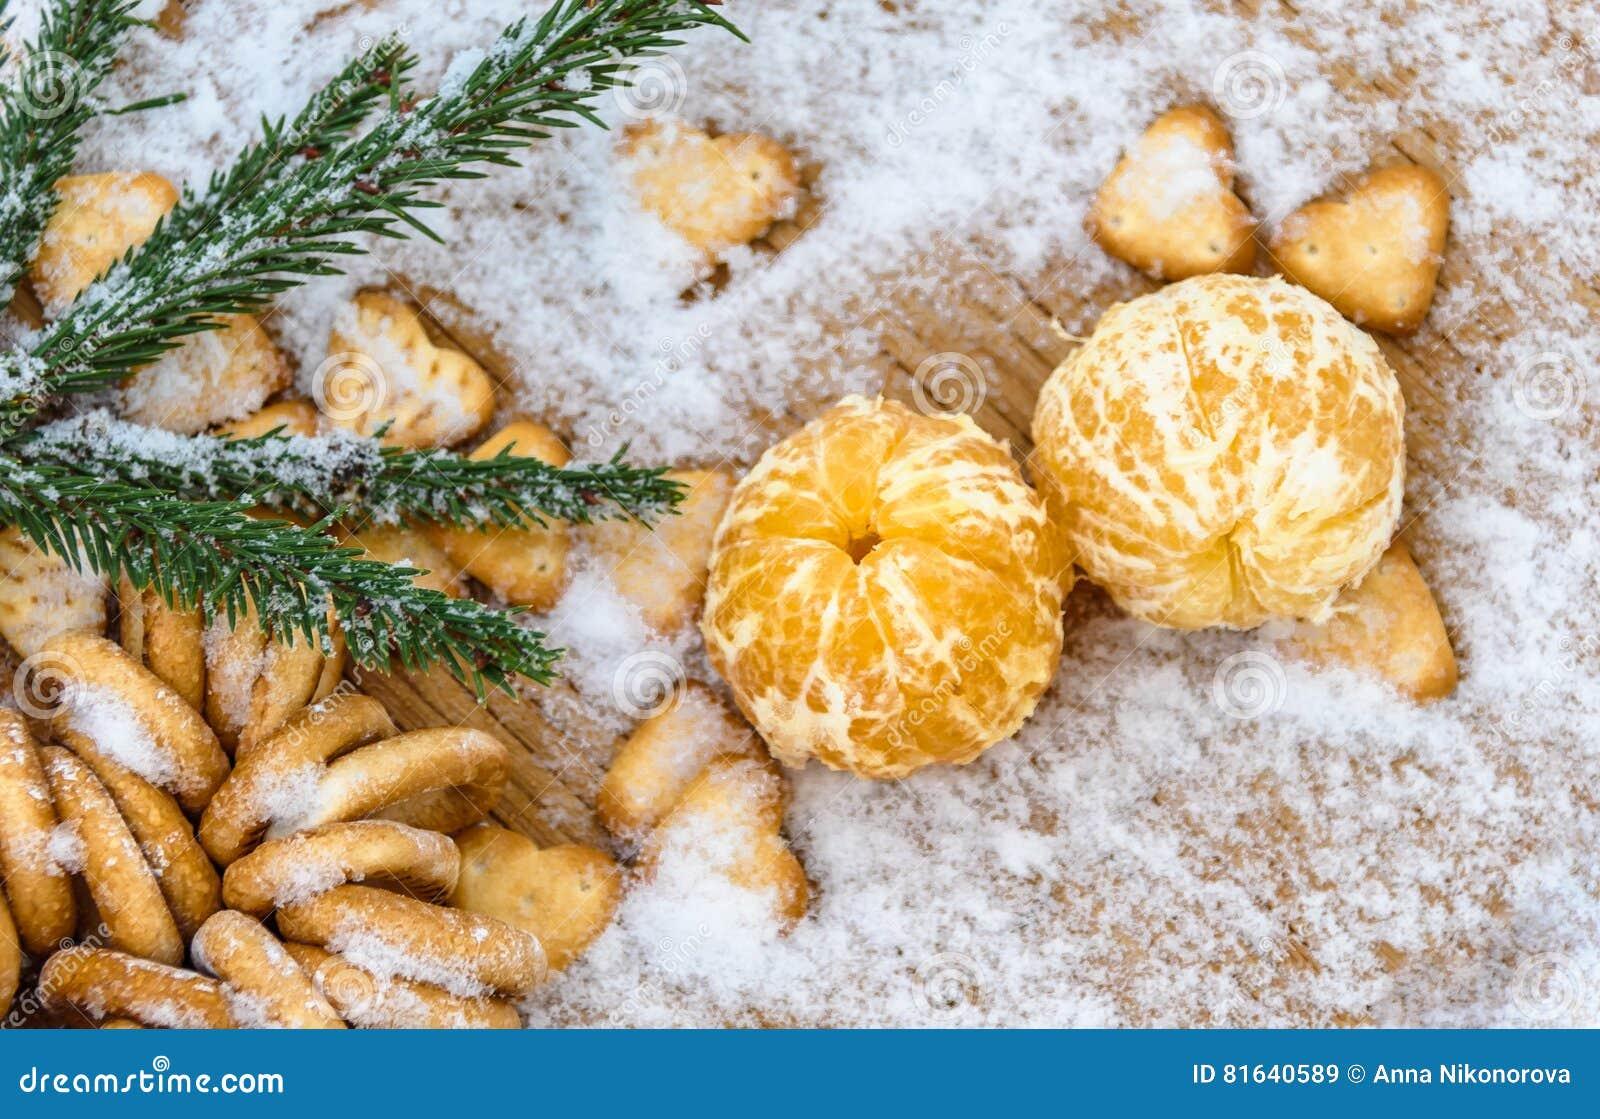 Tangerines в снеге на деревянном столе, Новом Годе, натюрморте